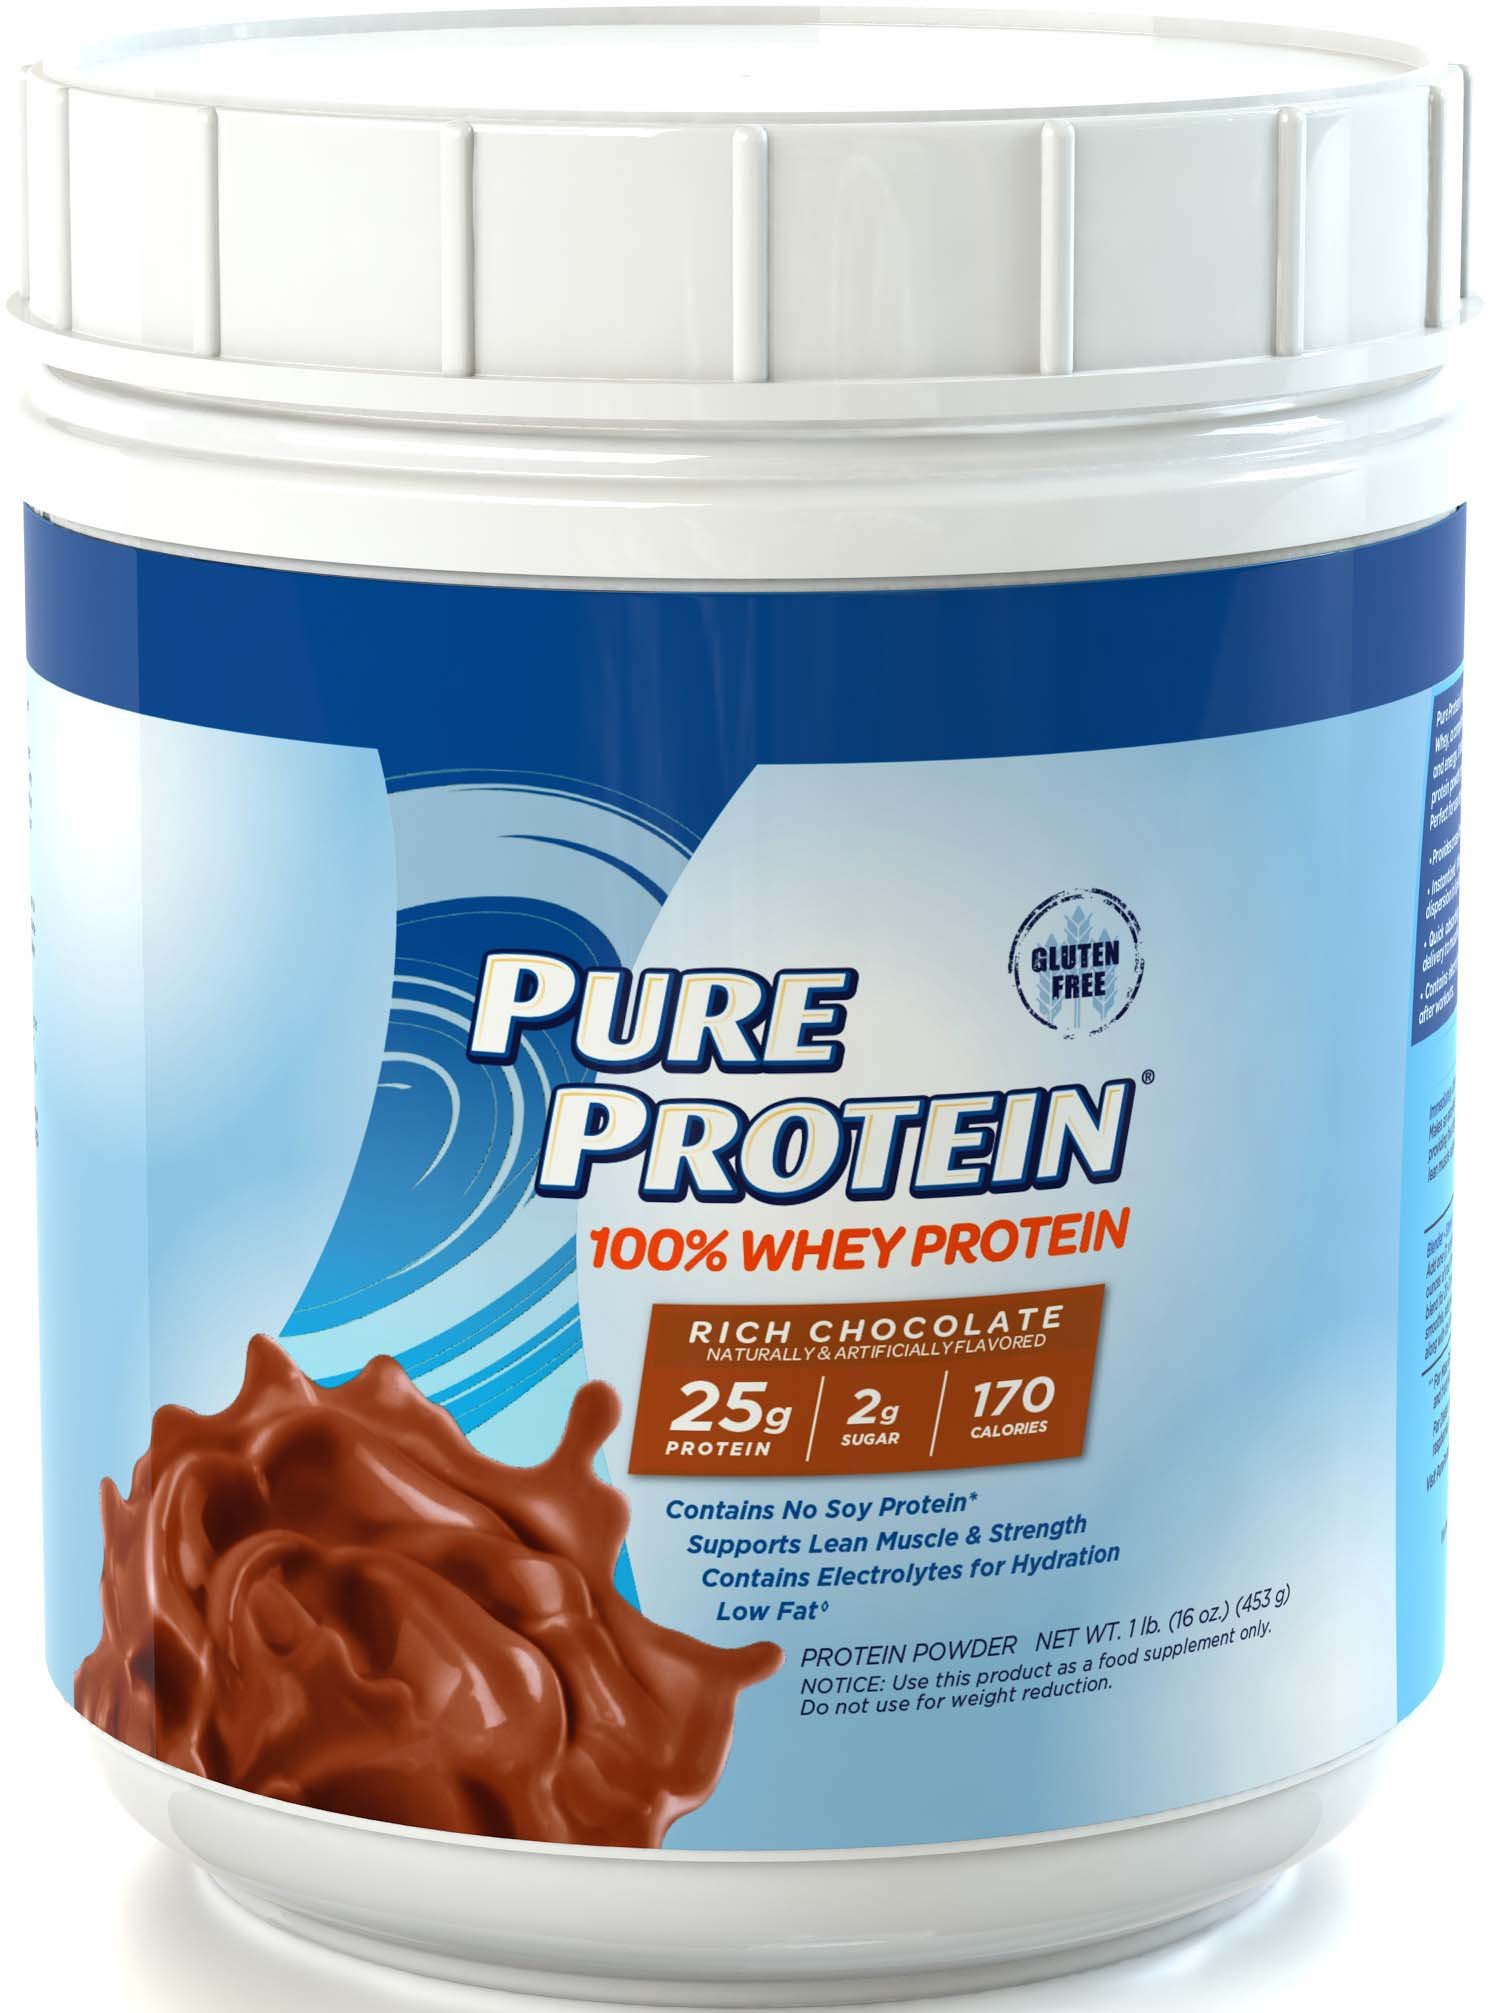 Pure Protein® 100% Whey Powder - Rich Chocolate, 1 pound